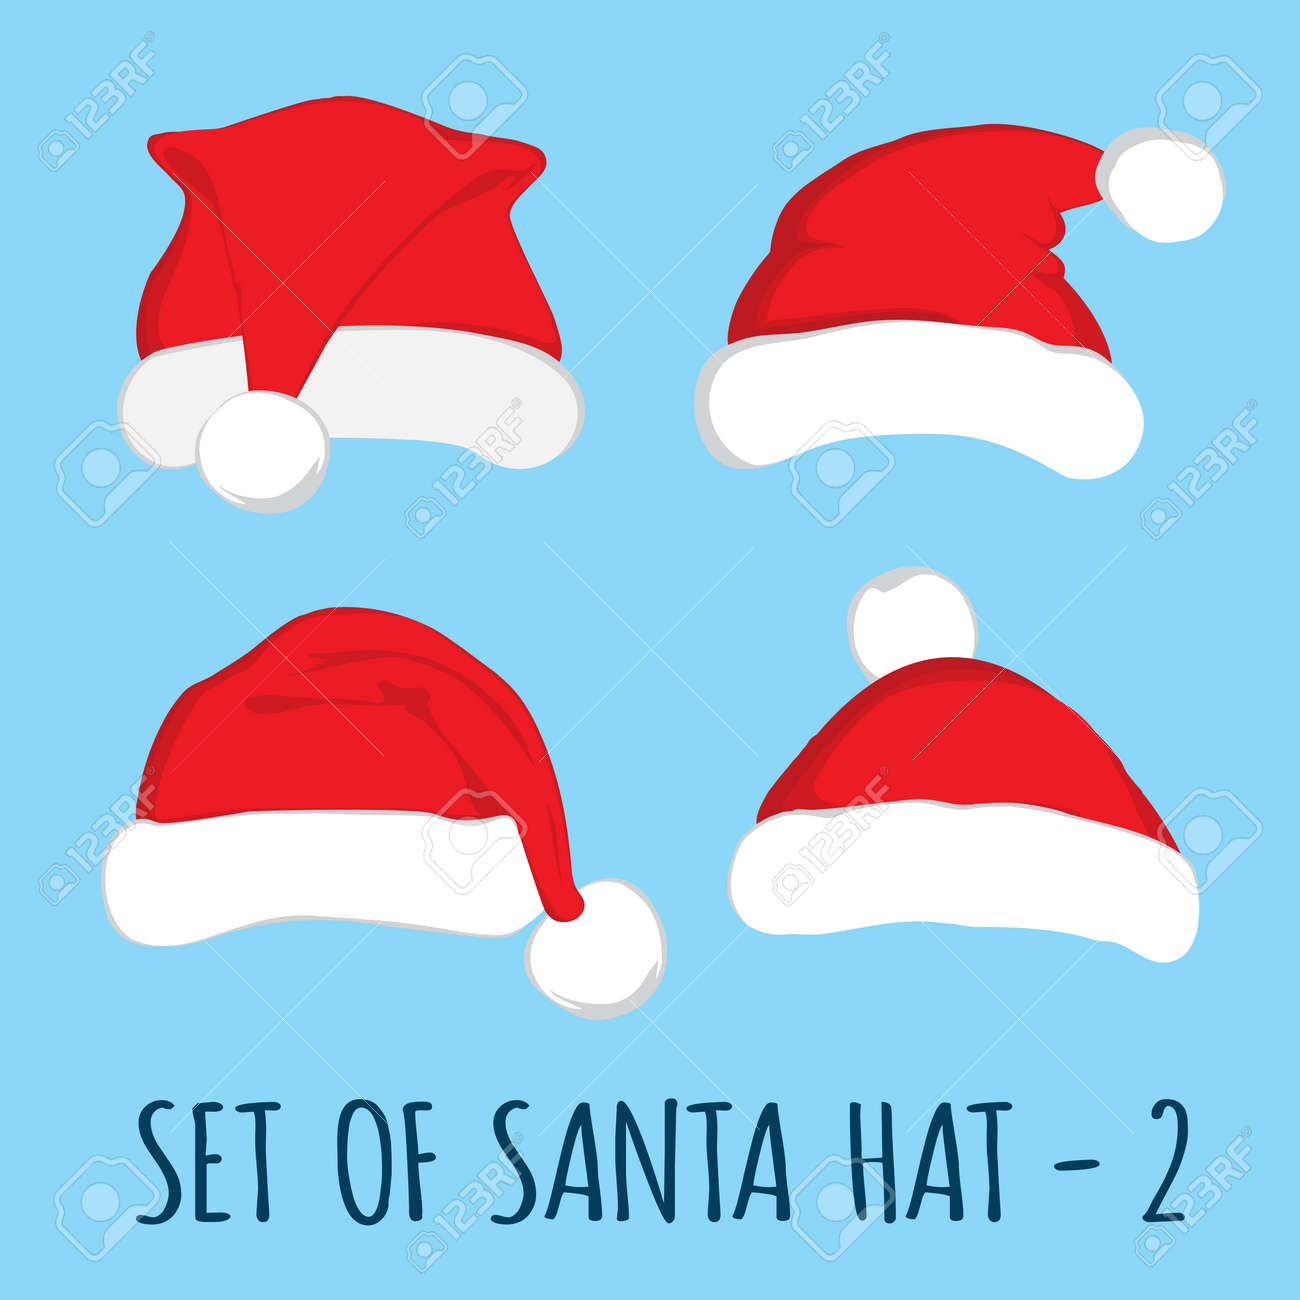 Santa Claus Hat Clipart | i2Clipart - Royalty Free Public Domain Clipart